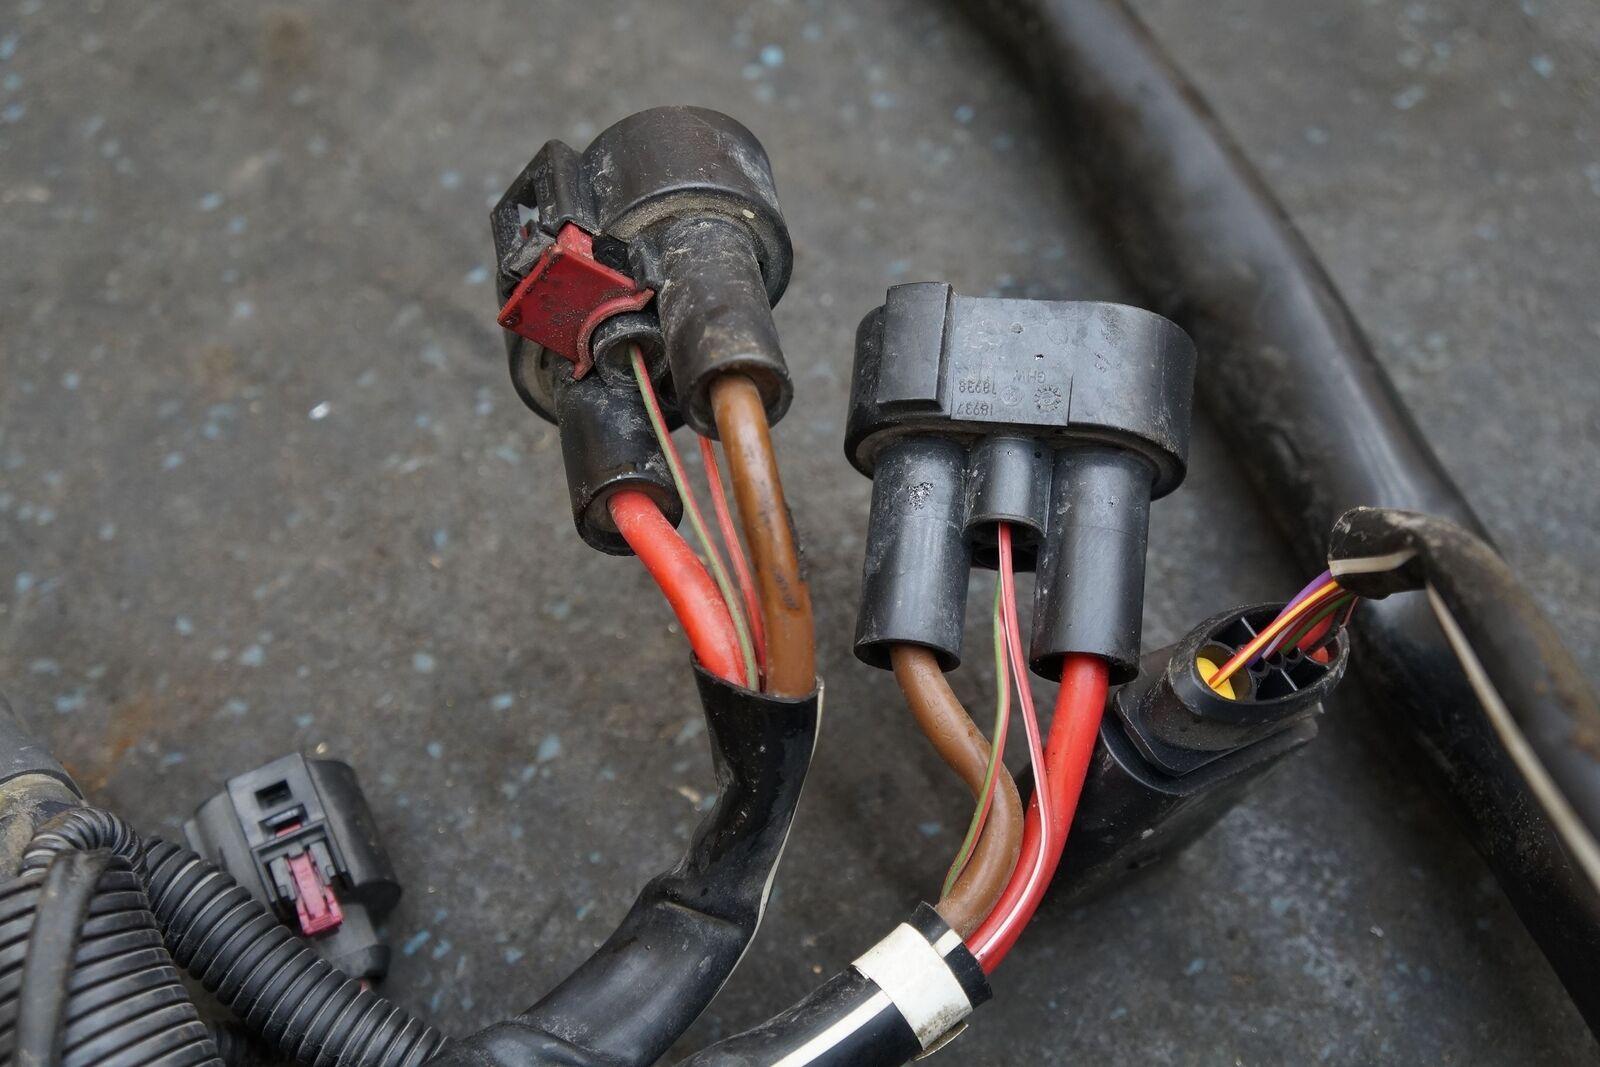 C10 Alternator Wiring Harness Diagram Get Free Image About Wiring